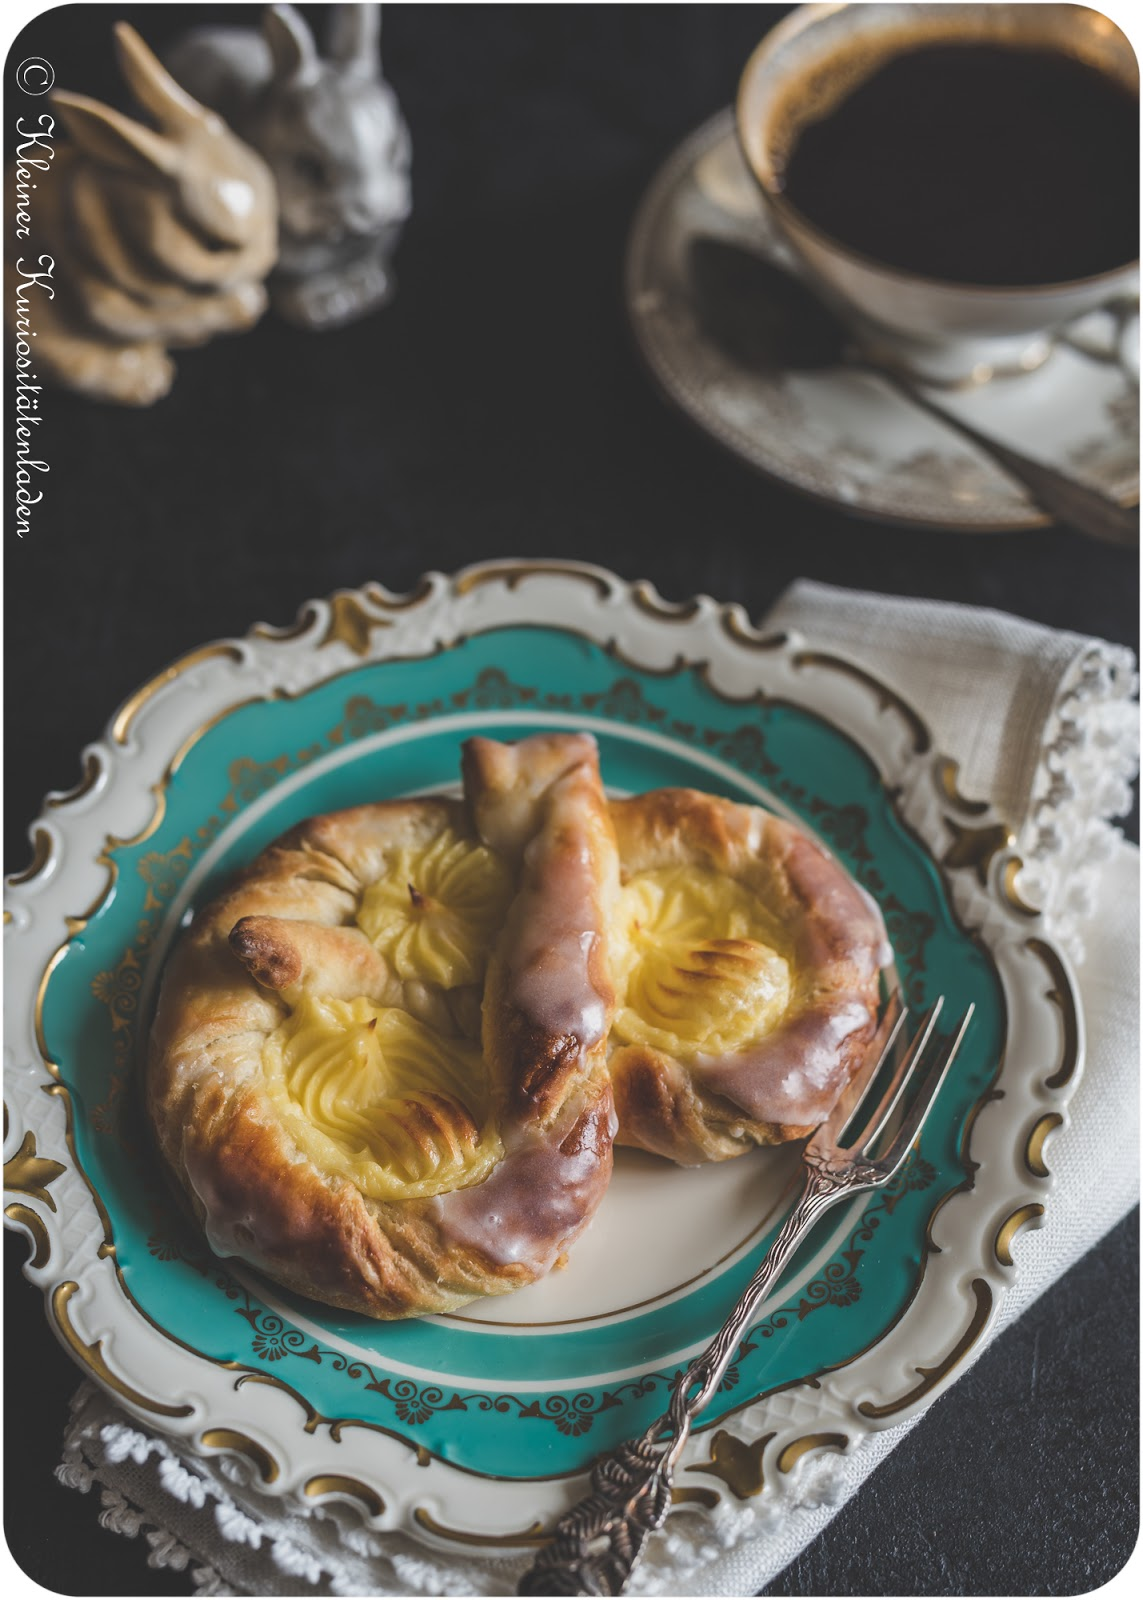 Puddingbrezel aus Plunderteig